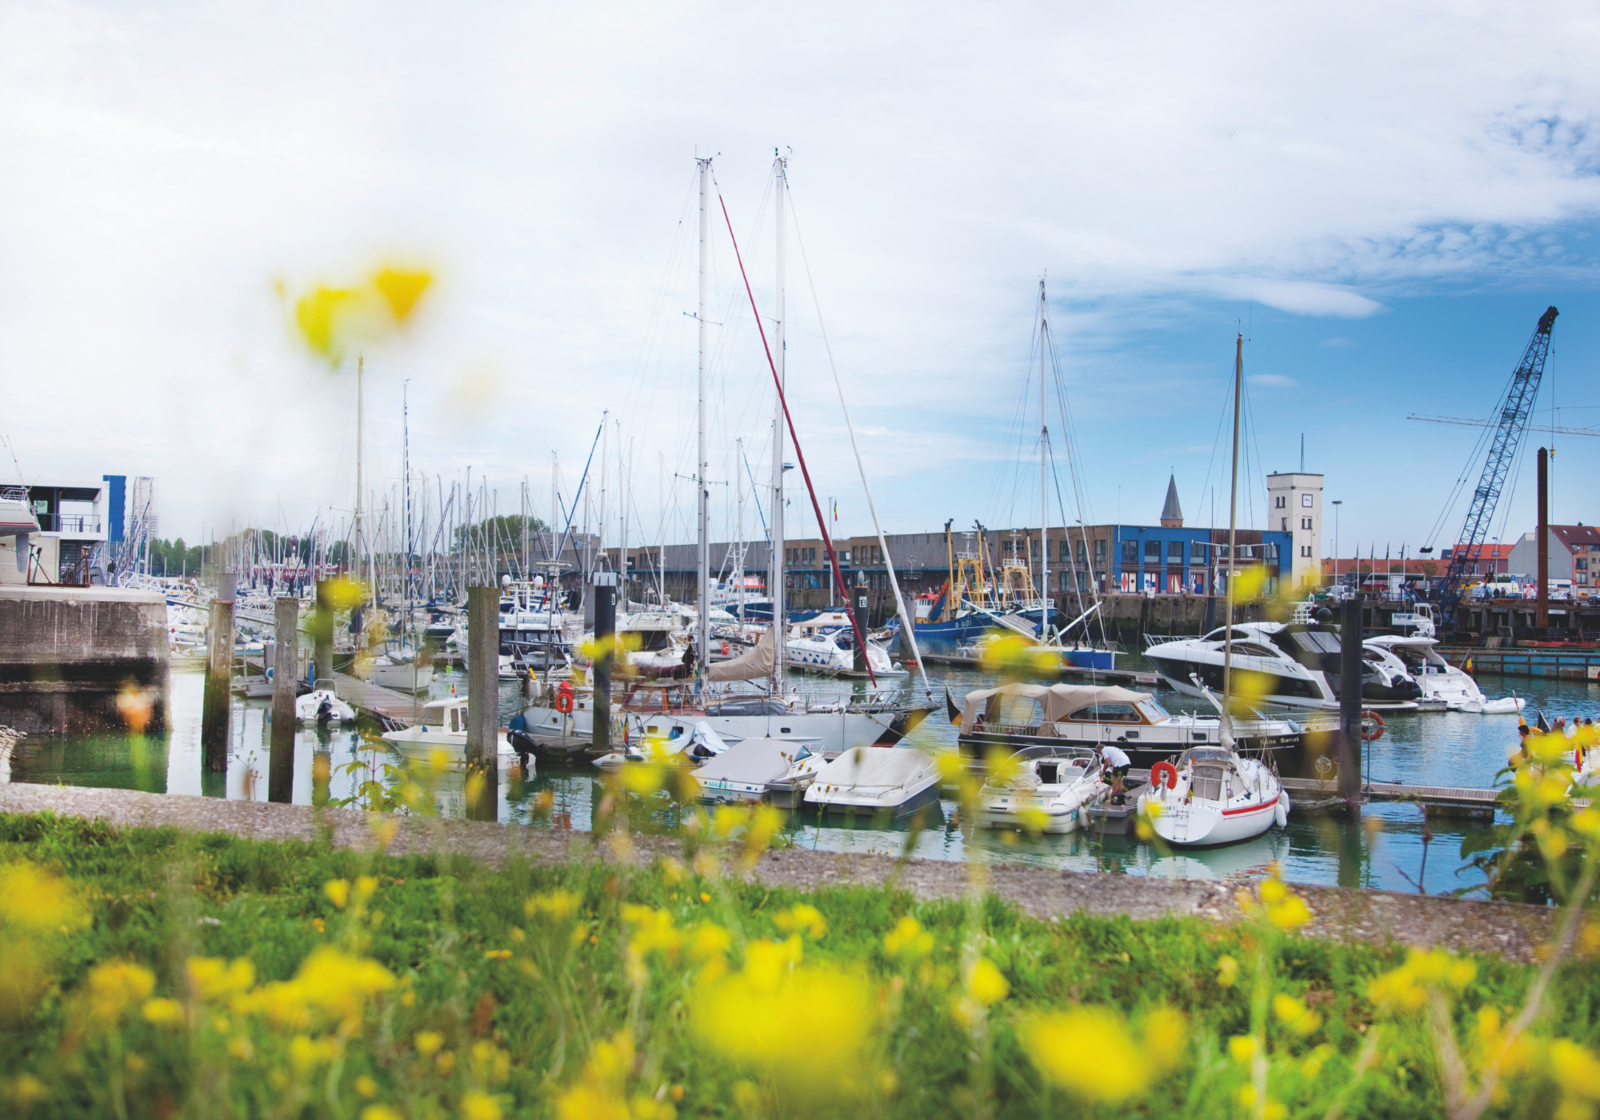 Holidays in Zeebrugge